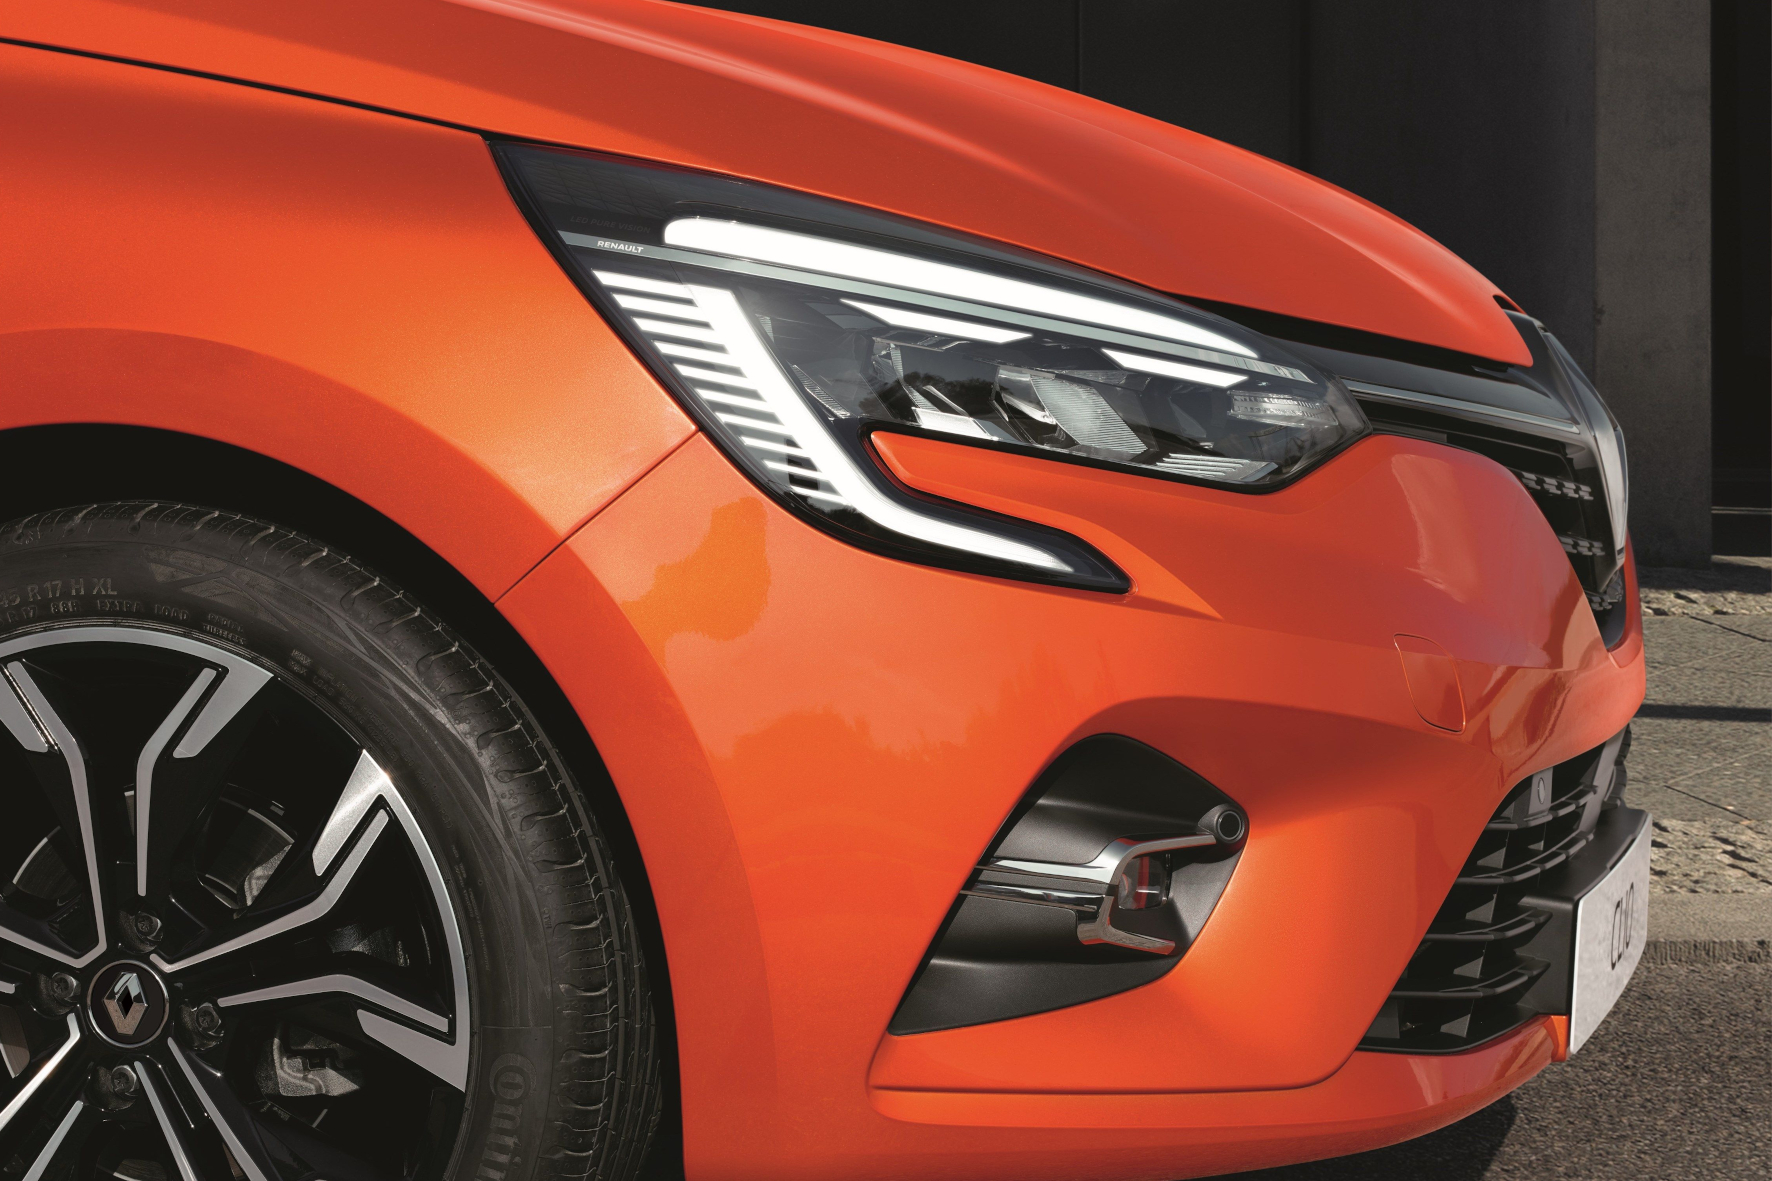 LED-Leuchten: Automobilclub fordert Reparatur-Konzepte